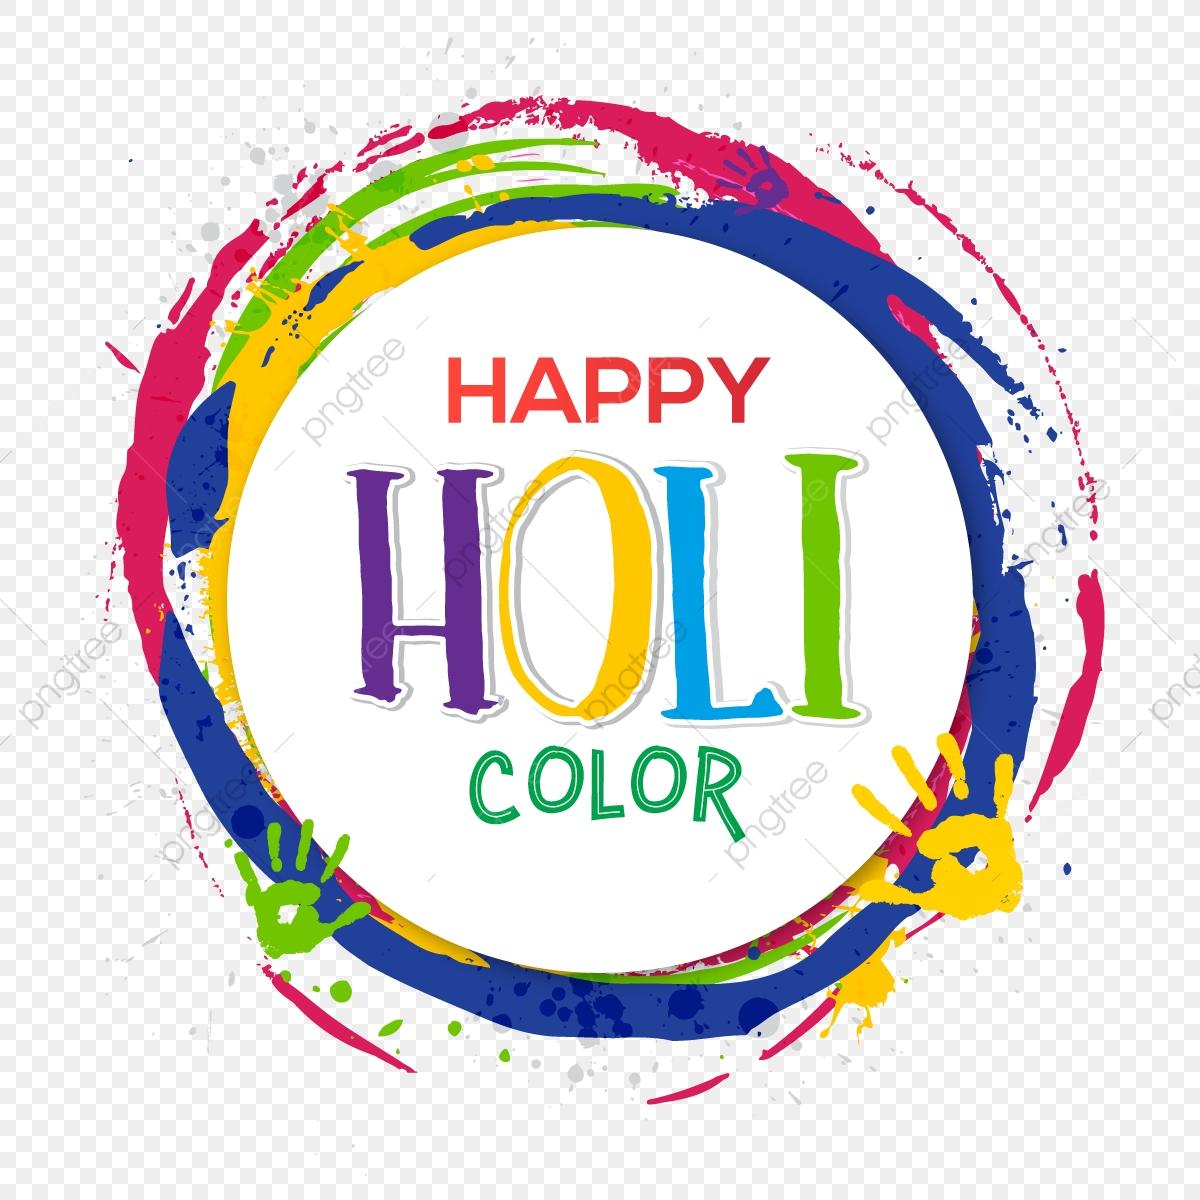 Holi Festival Greeting With Colorful Circle Shape, Holi, Festival.